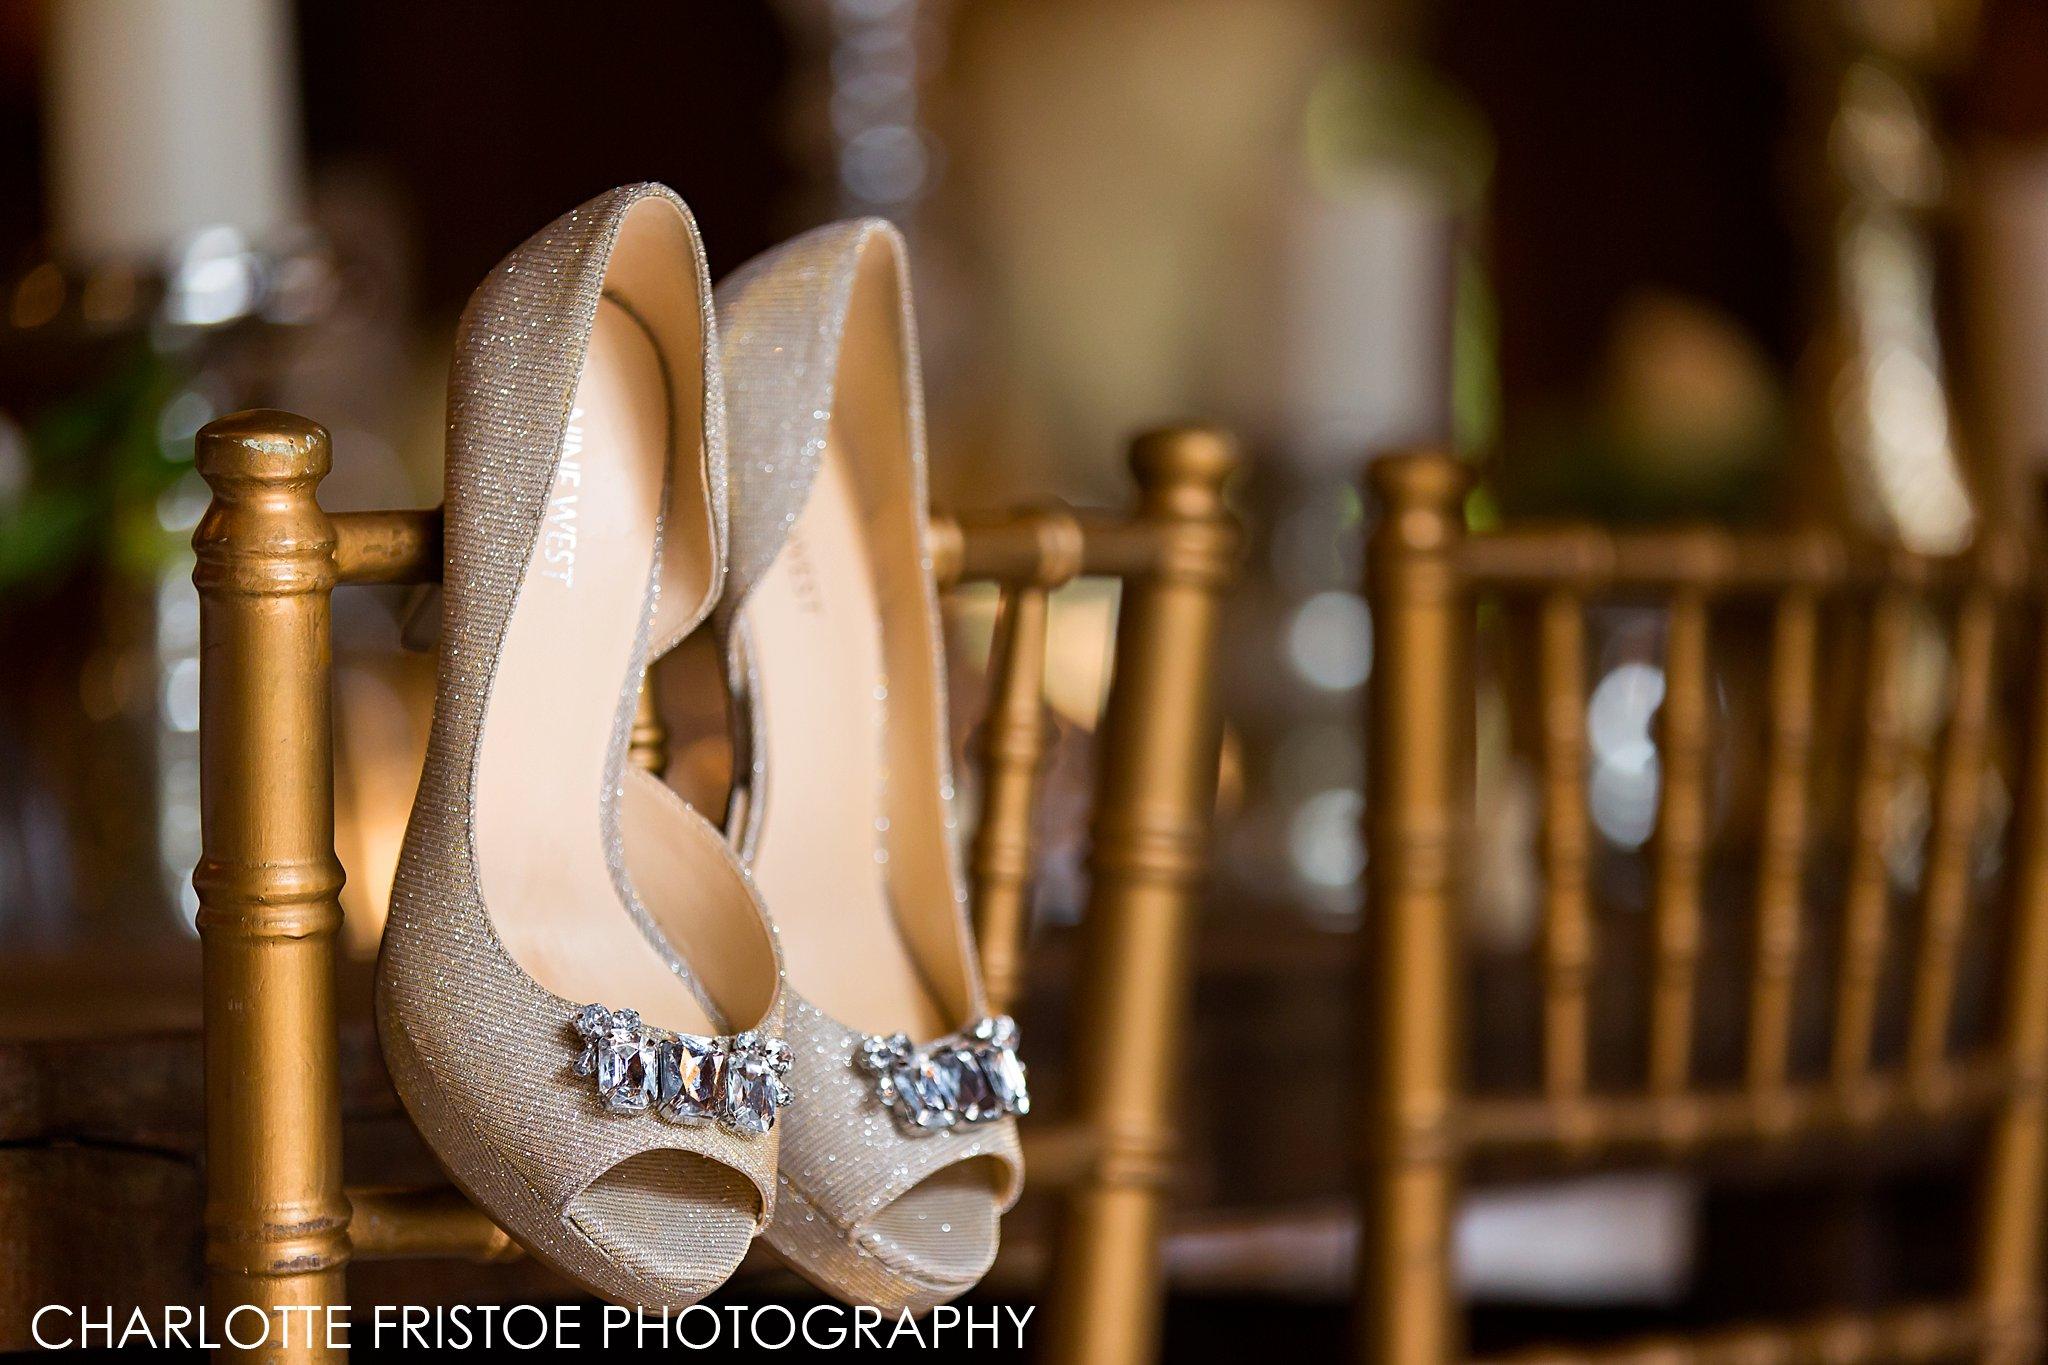 Charlotte Fristoe Photography Blog-7.jpg